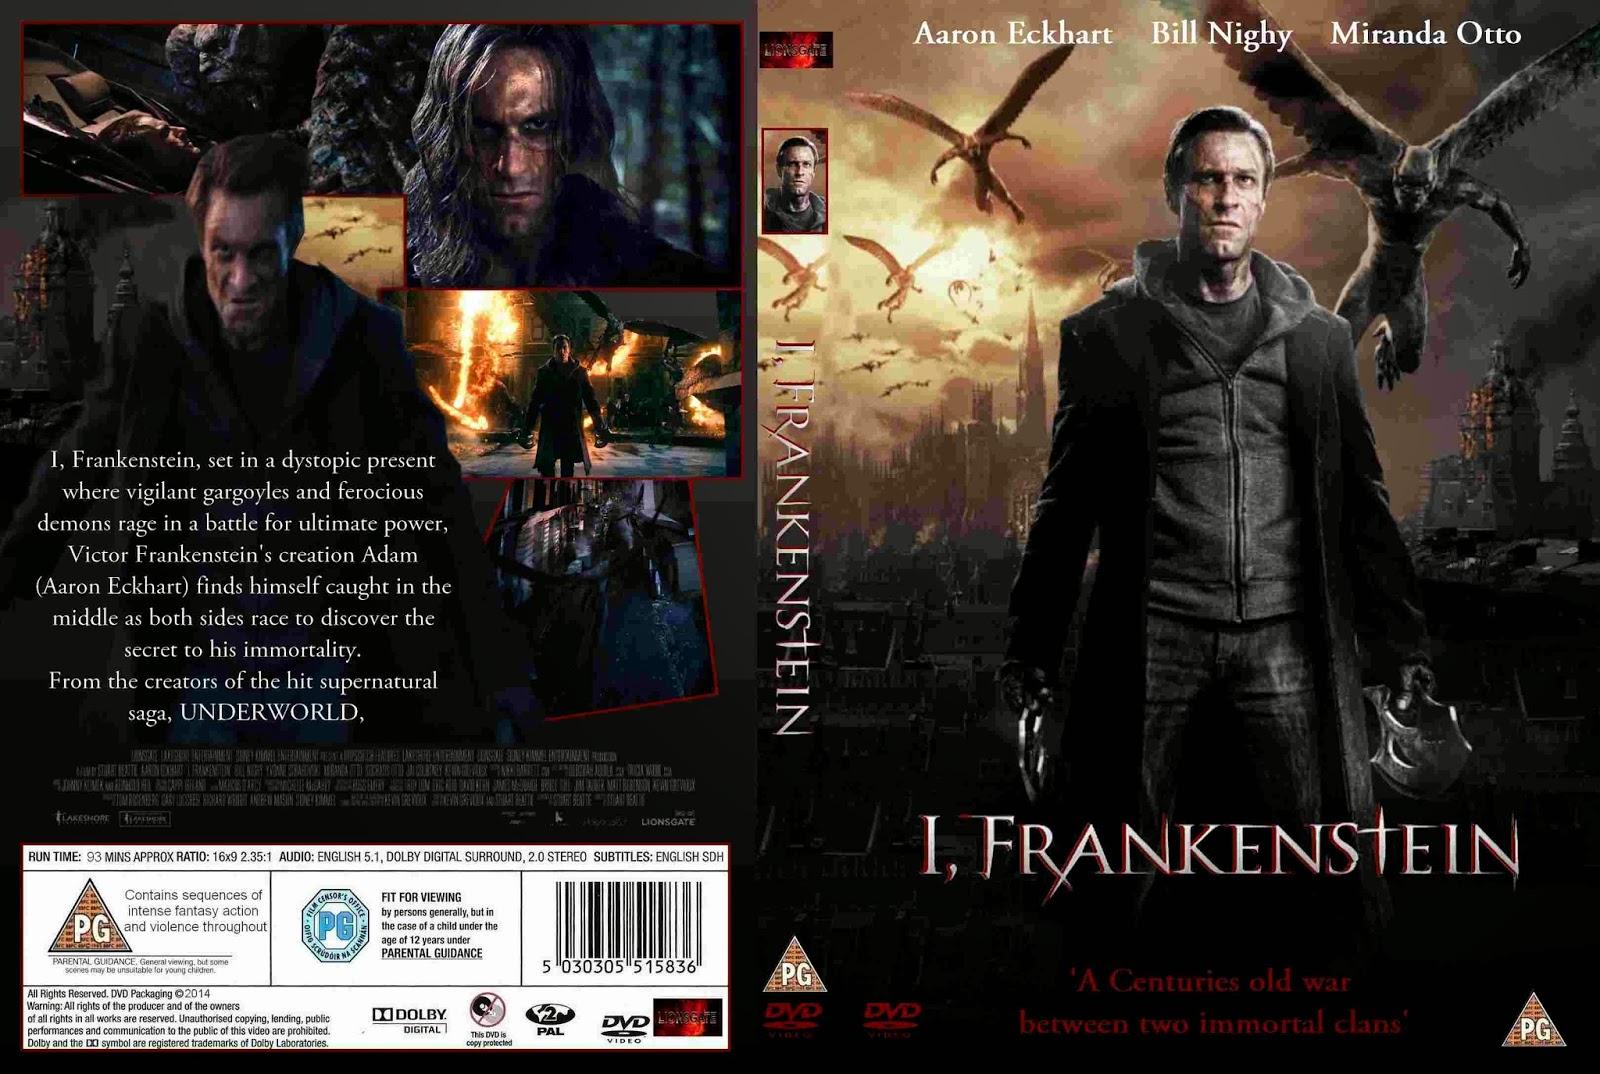 victor frankenstein and his secrets